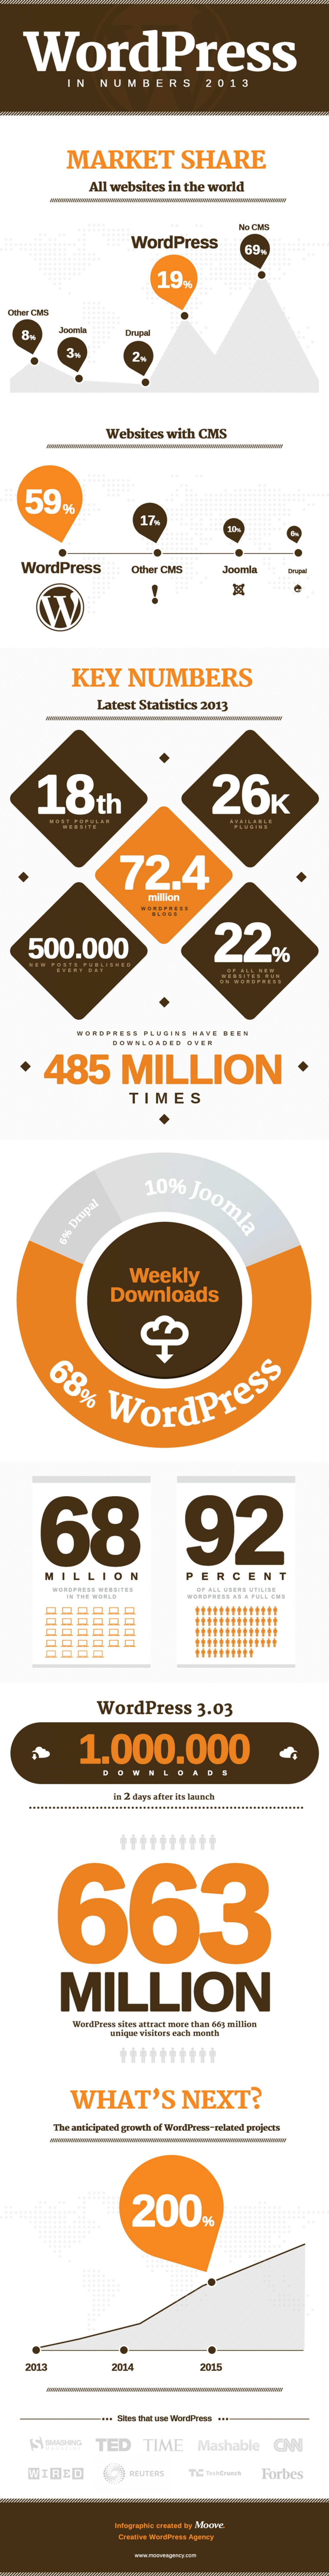 1. WordPress in Numbers